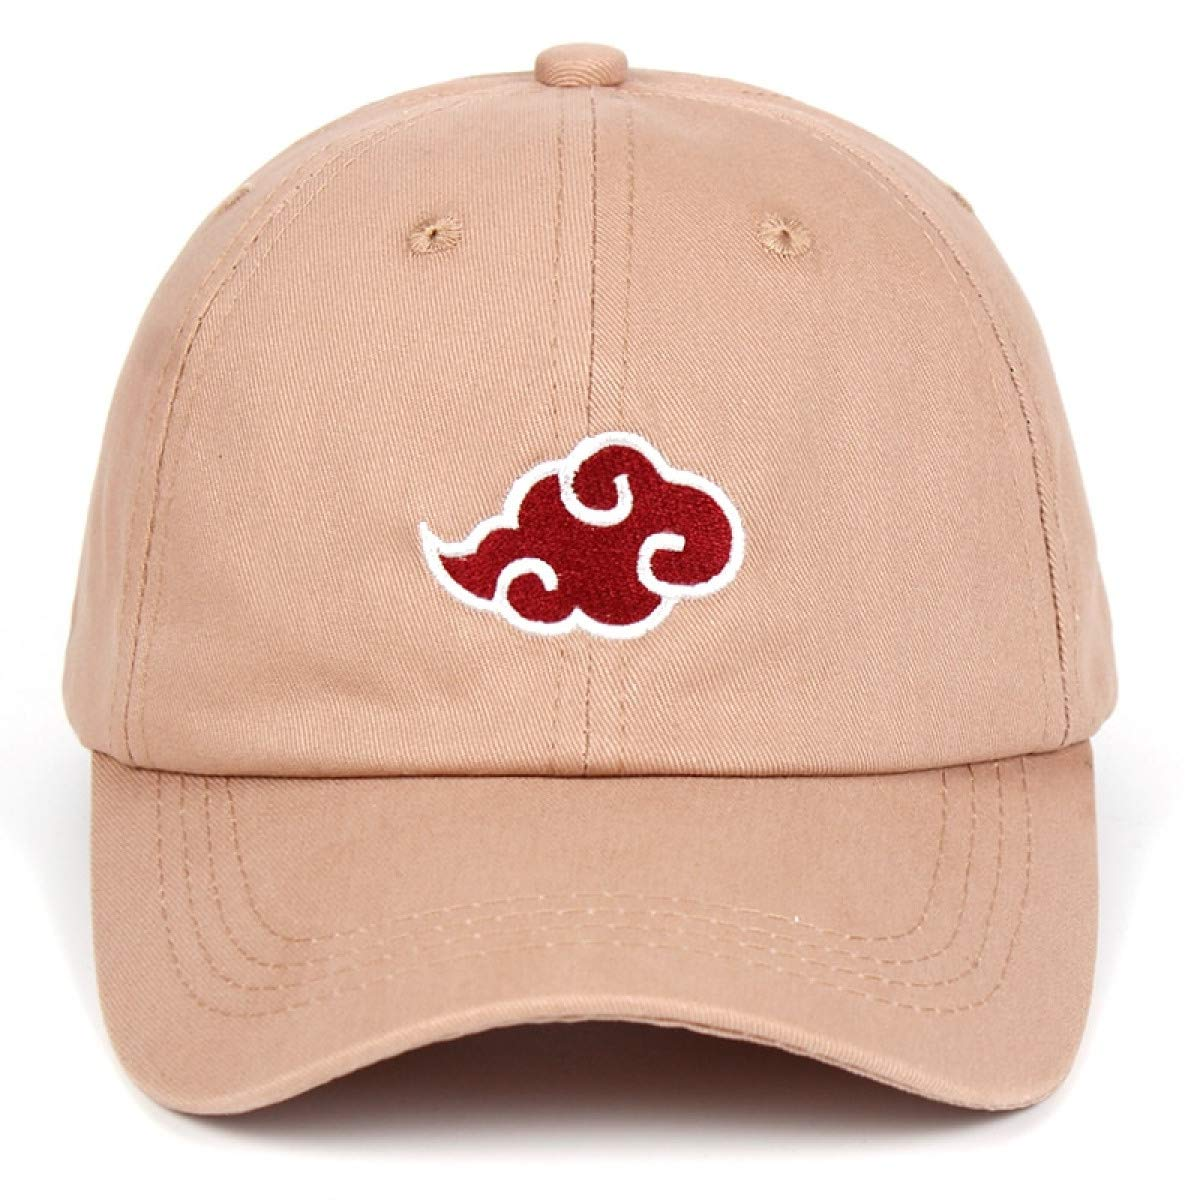 2d39b6cab 100% Cotton Japanese Akatsuki Logo Anime Naruto Dad Hat Uchiha ...